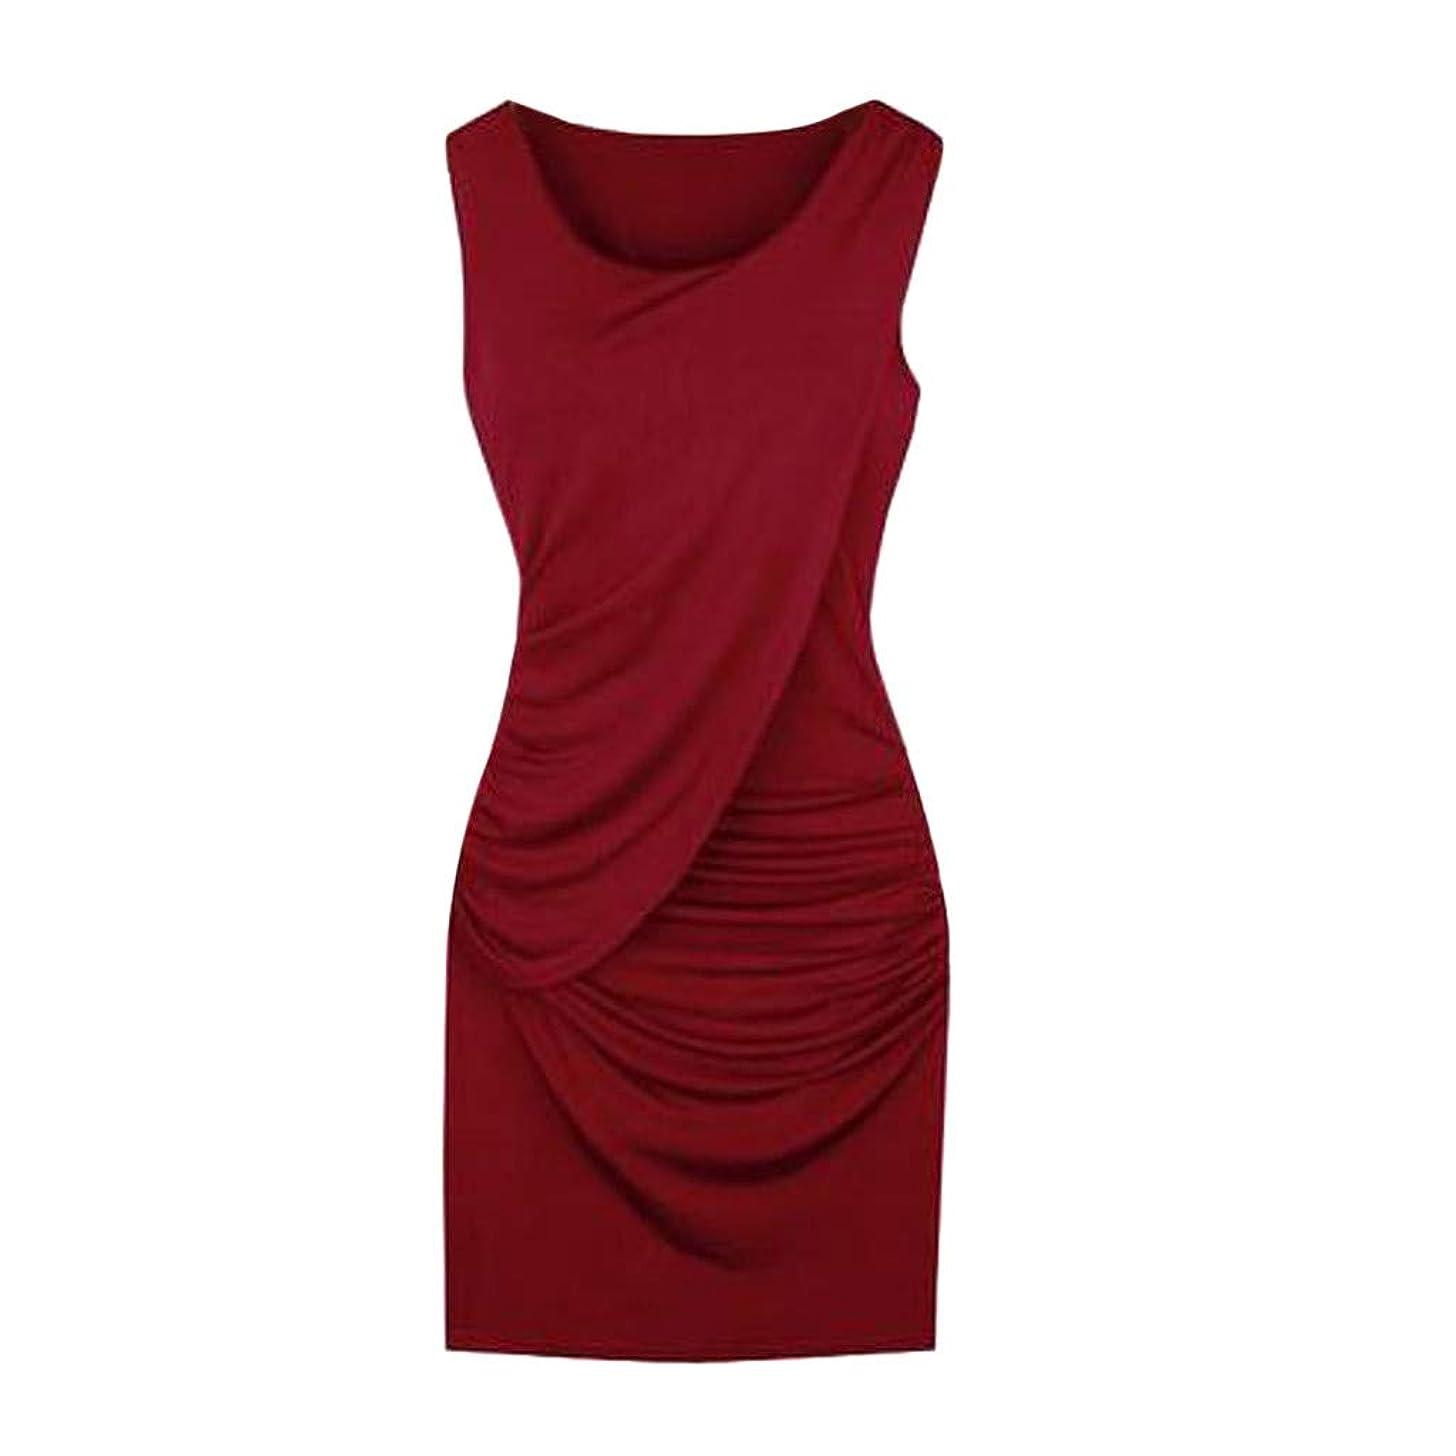 Goddessvan Plus Size Elegant Dress Women Summer Ruched Bodycon Sundress Sleeveless Party Dress